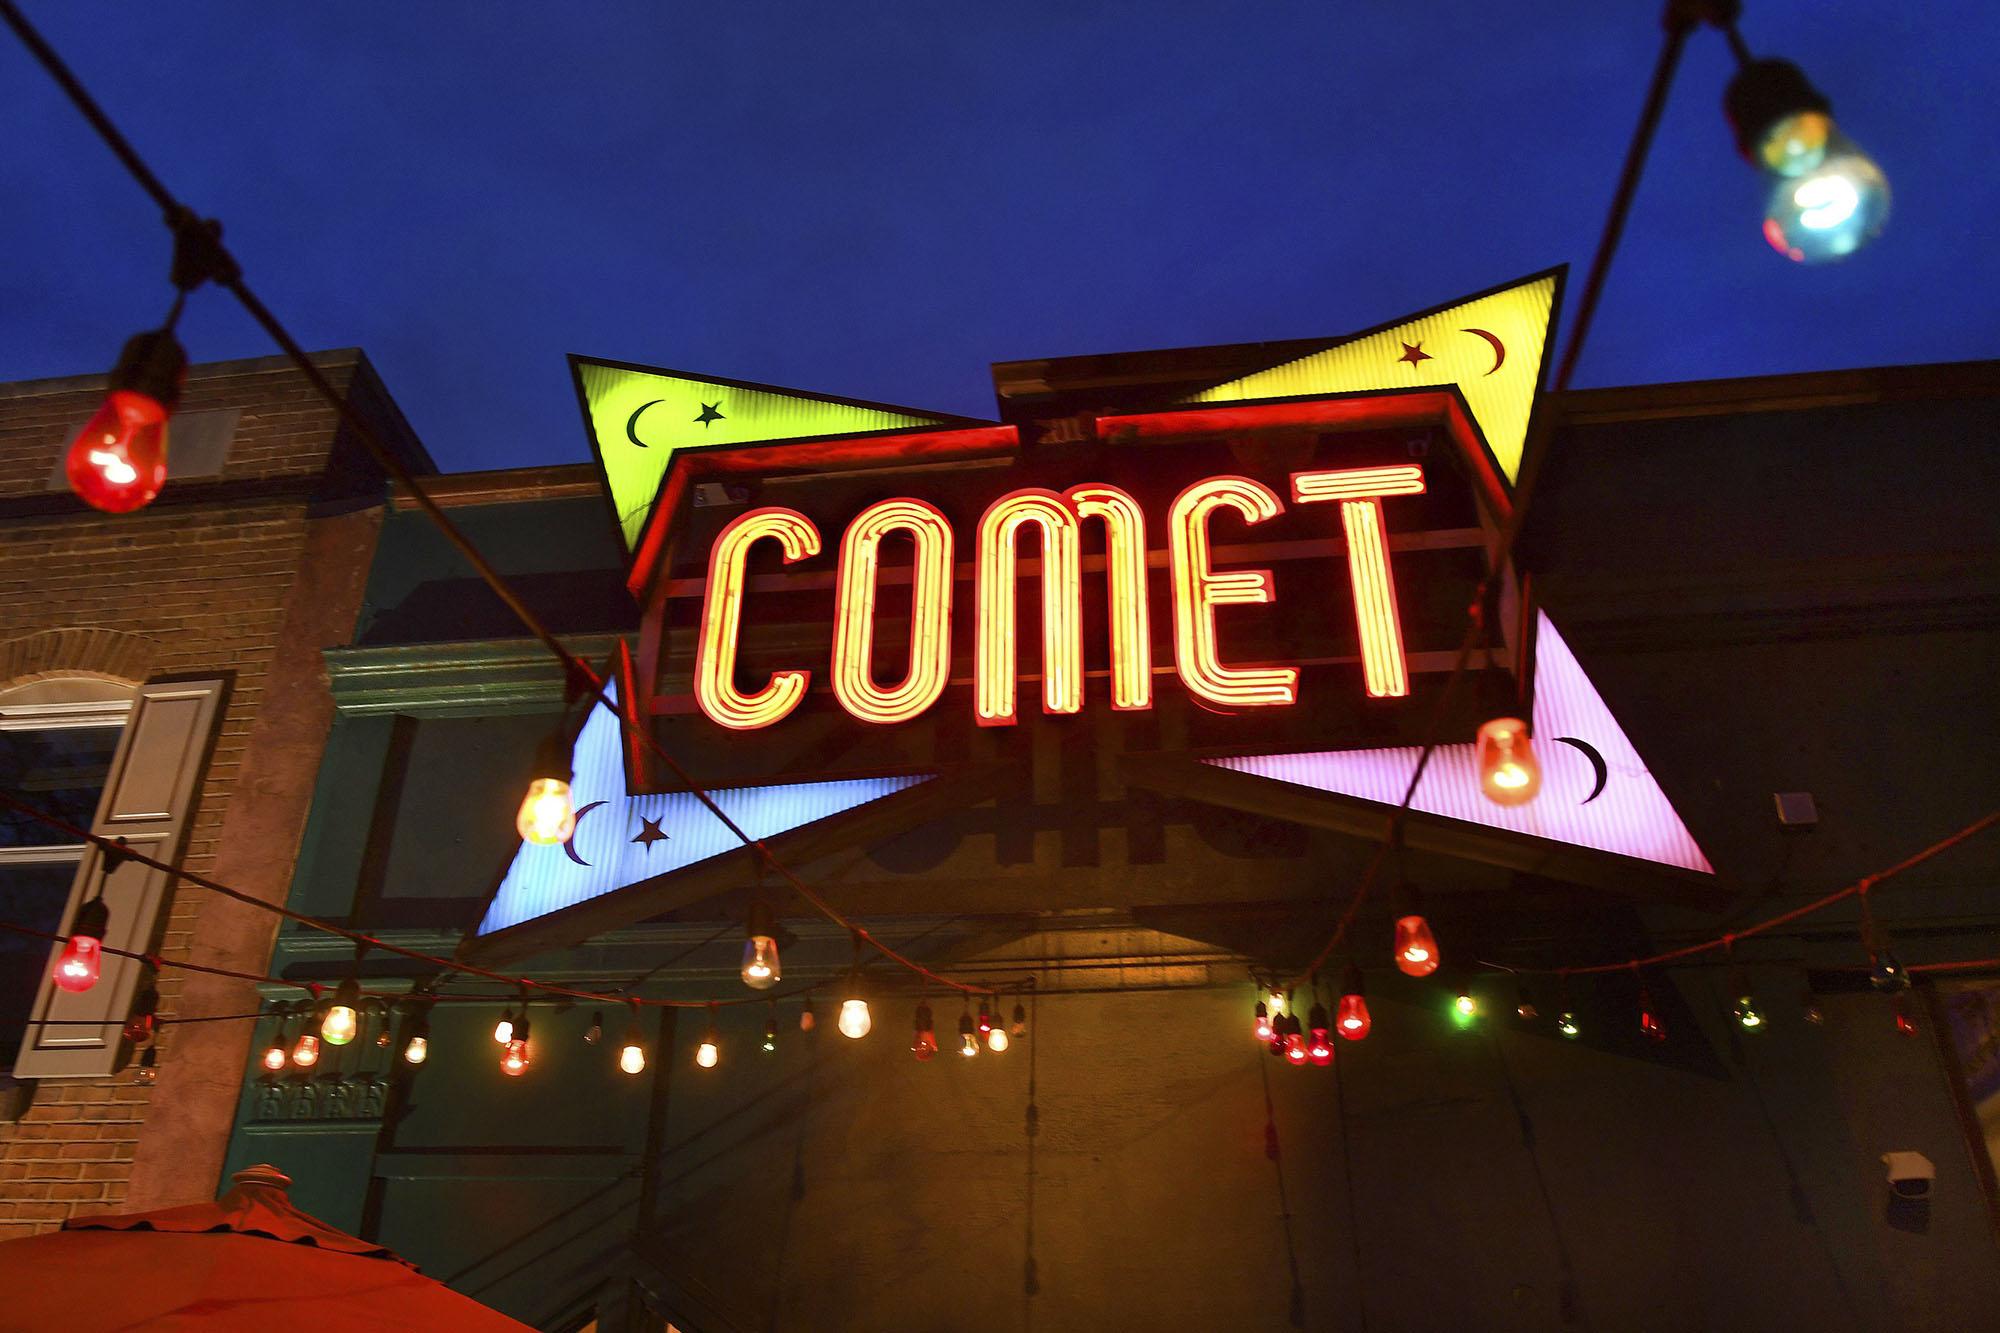 Comet: Restaurante do Pizzagate/ Washington Post